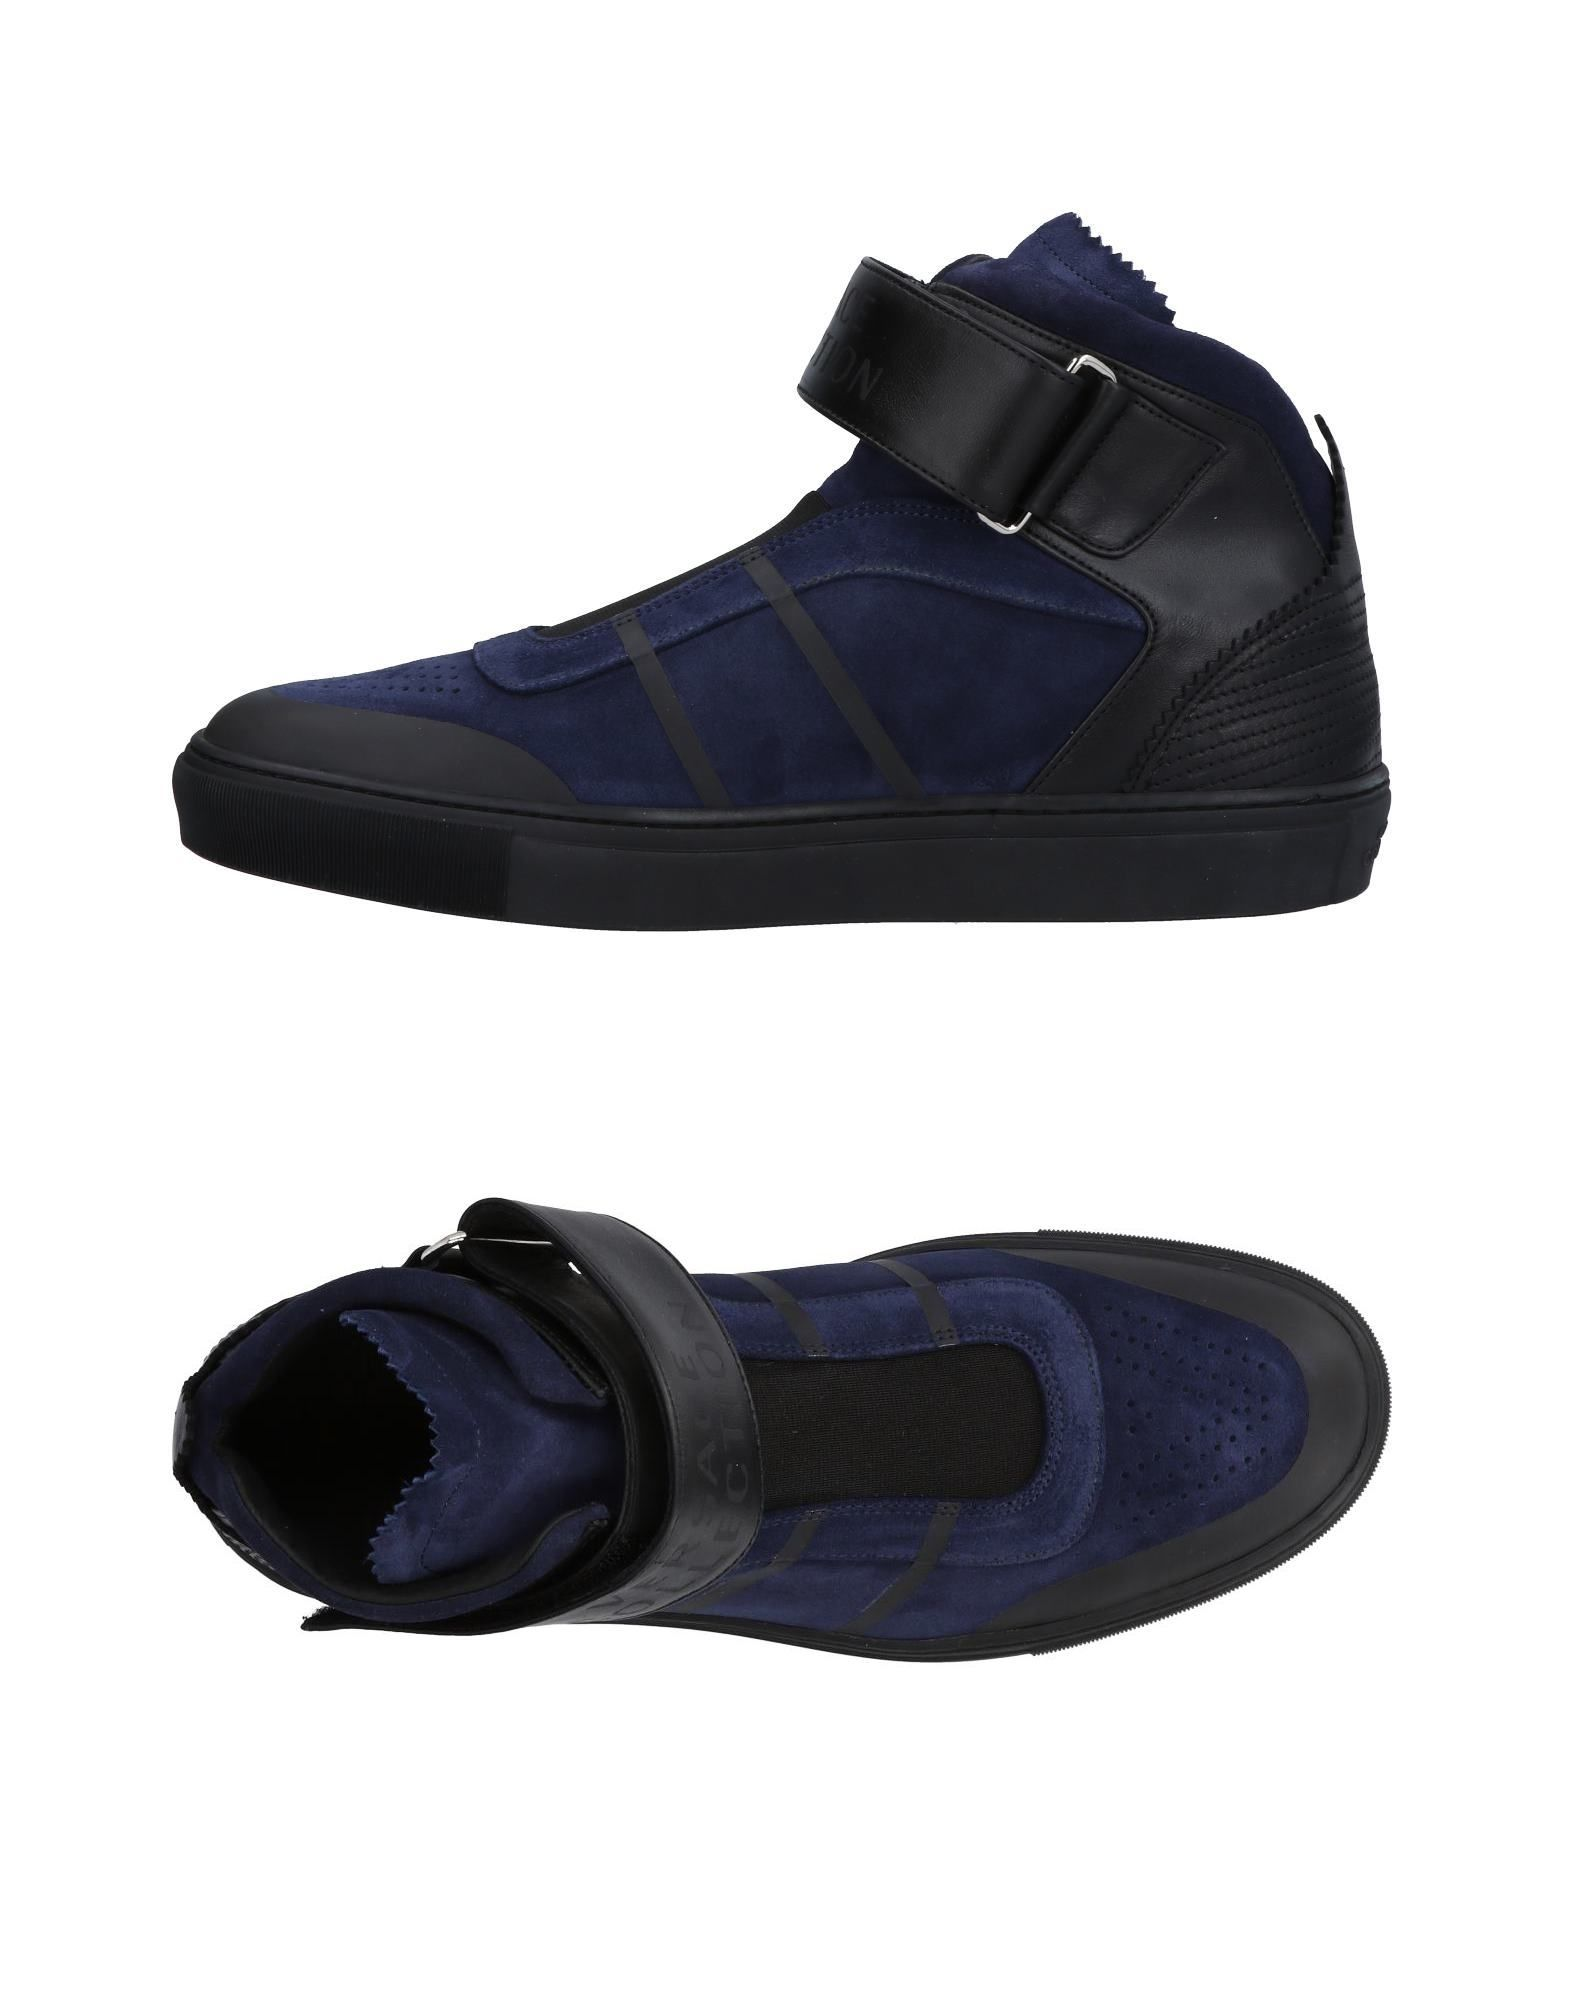 Versace Collection Sneakers Herren  11465527SD Gute Qualität beliebte Schuhe